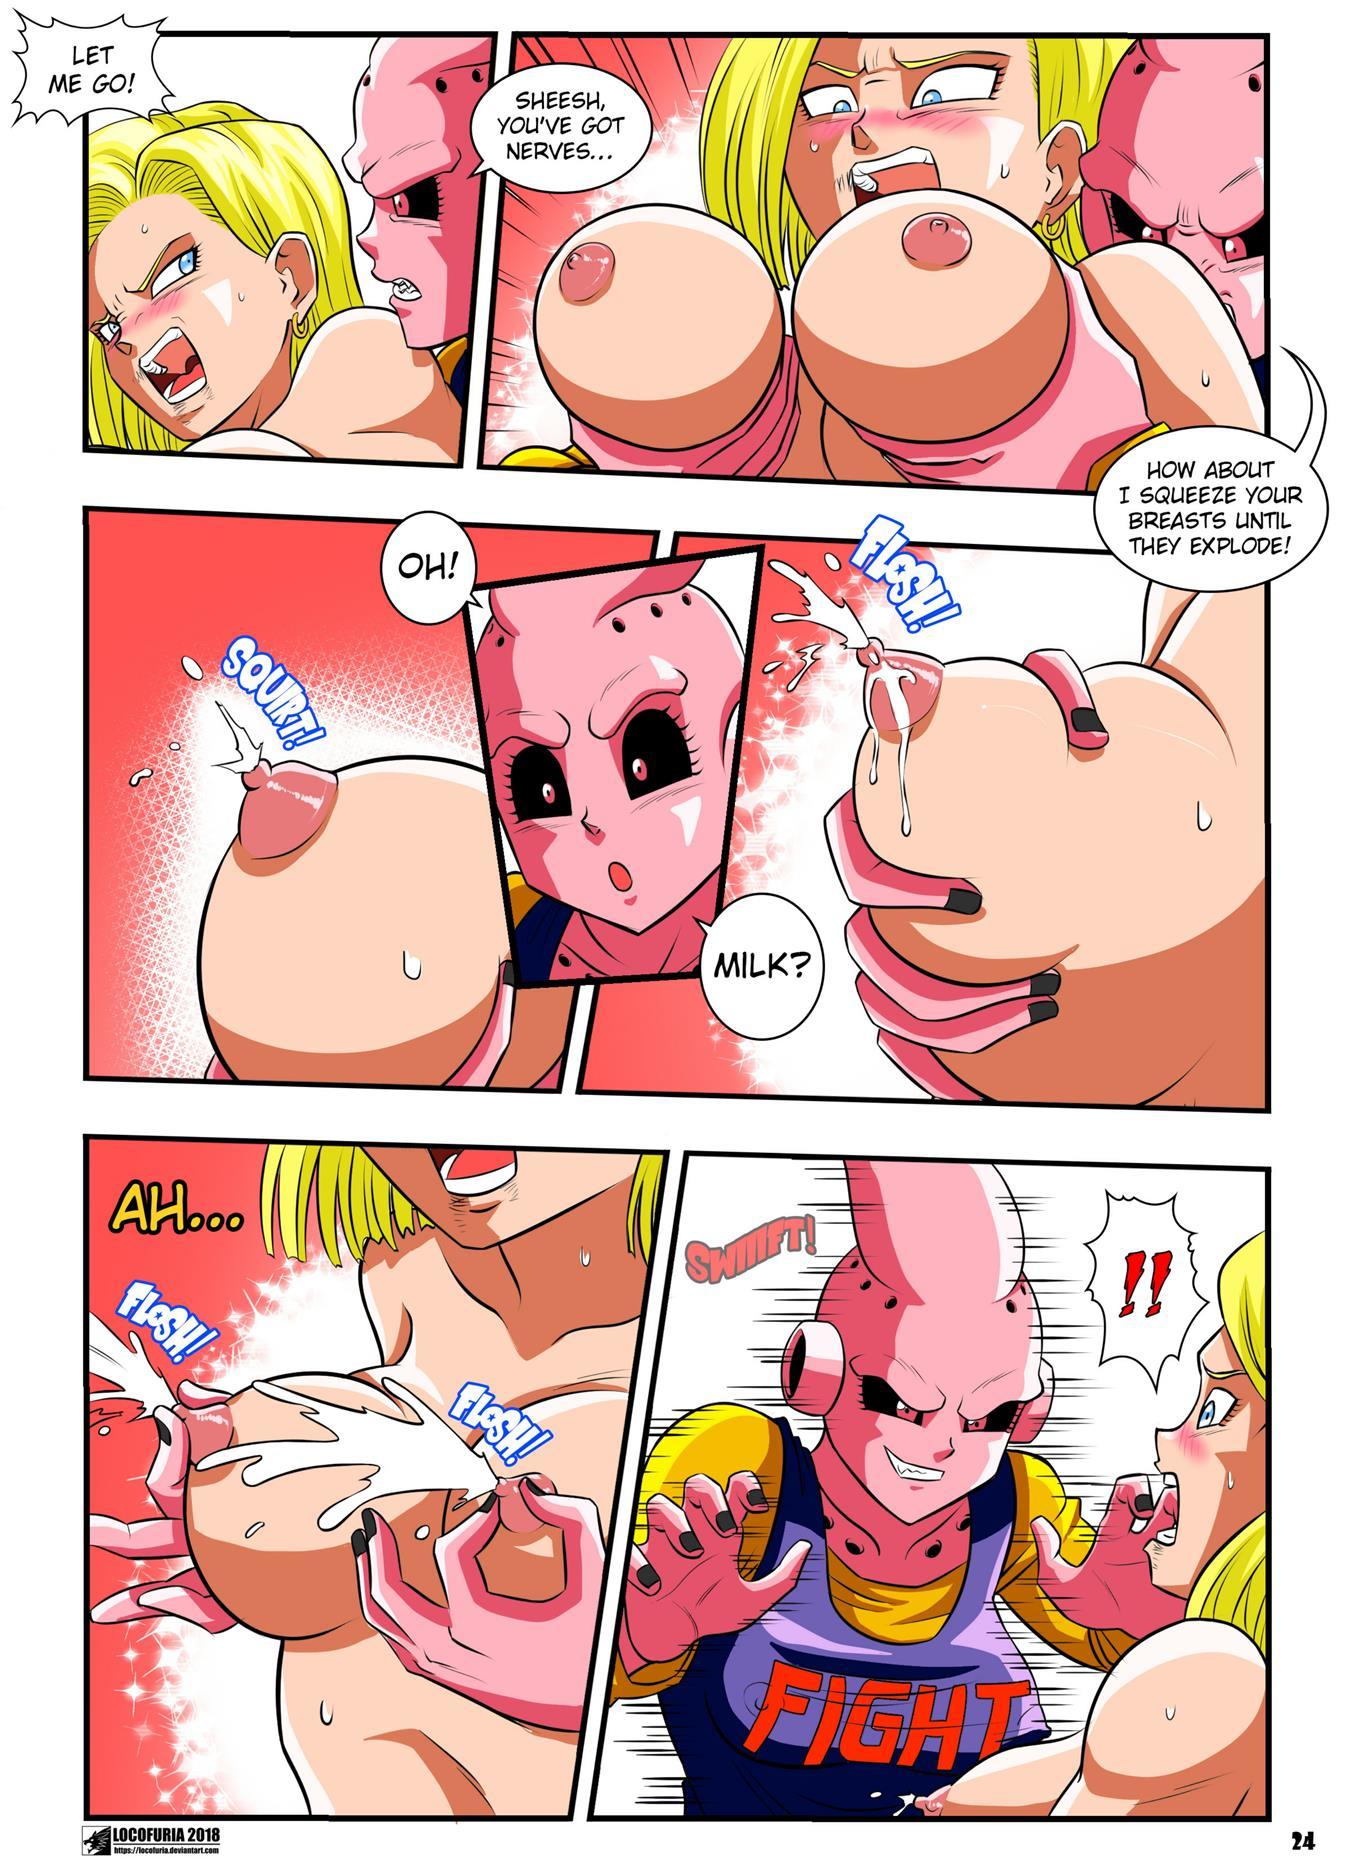 Buu's Bodies 3 (Dragon Ball Z) - Foto 26